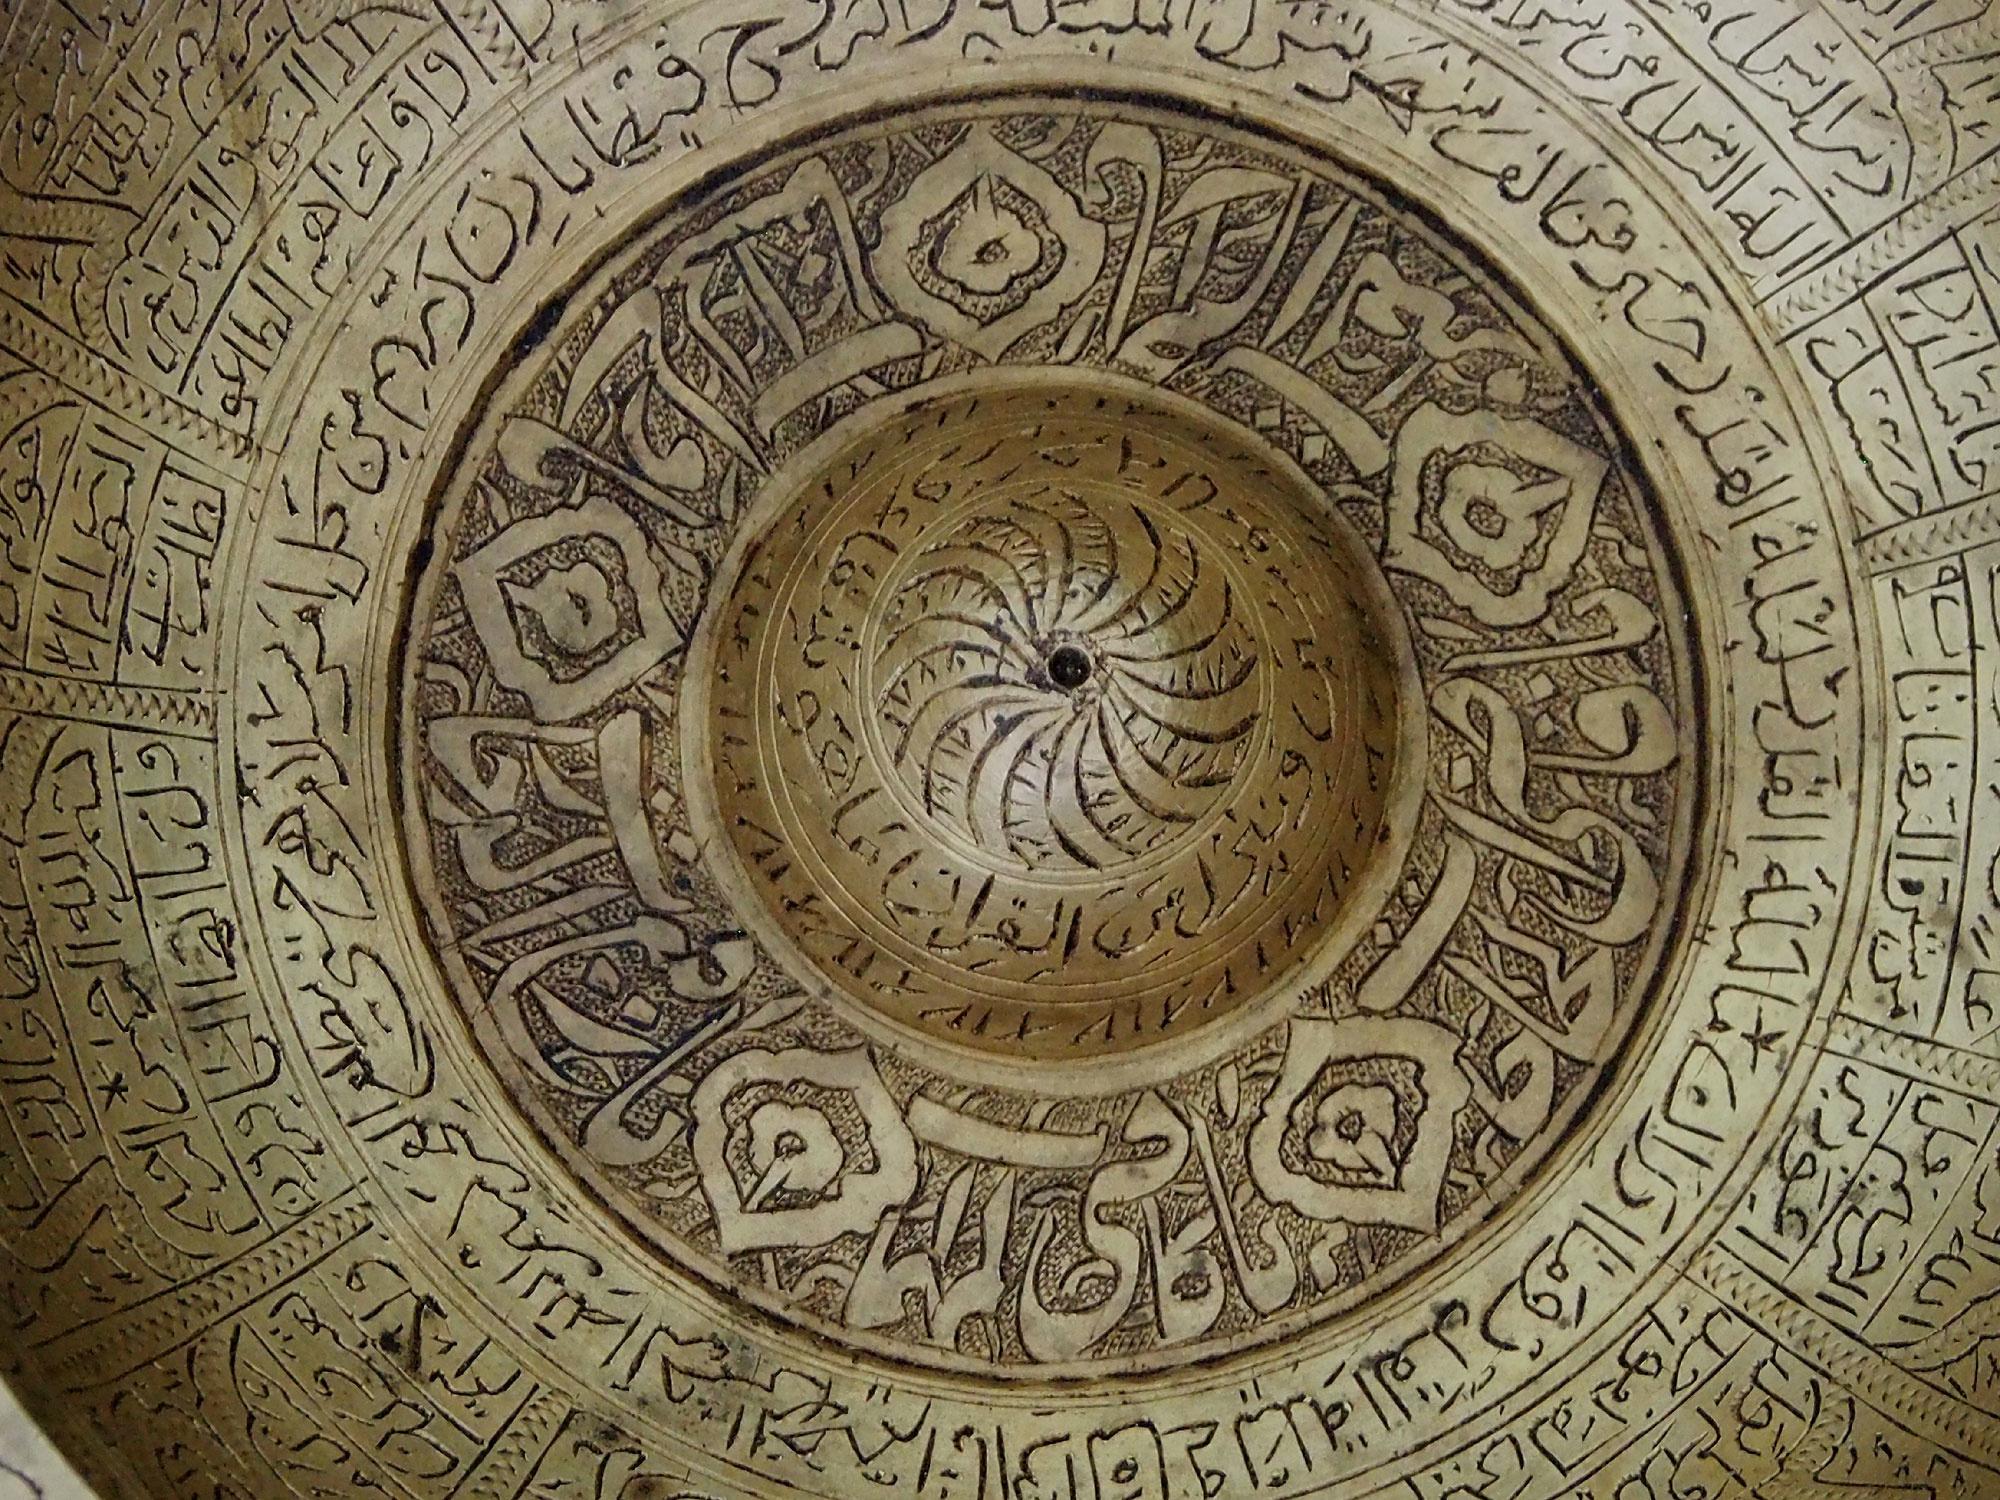 Antik islamische Messing Magische Schale  19/A